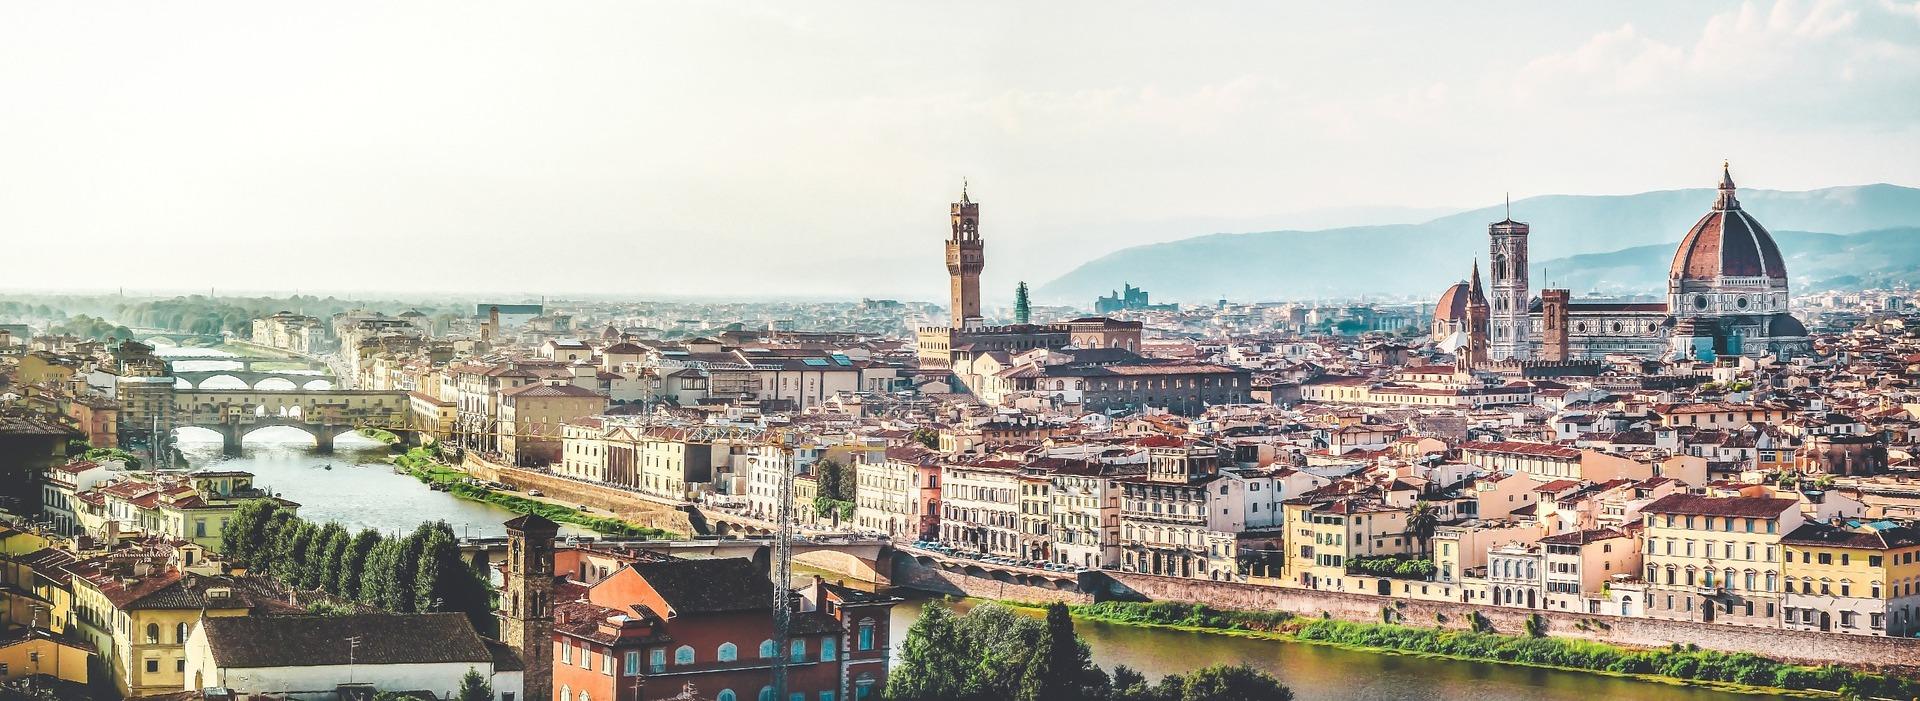 Autotransport Italien Fahrzeugtransport